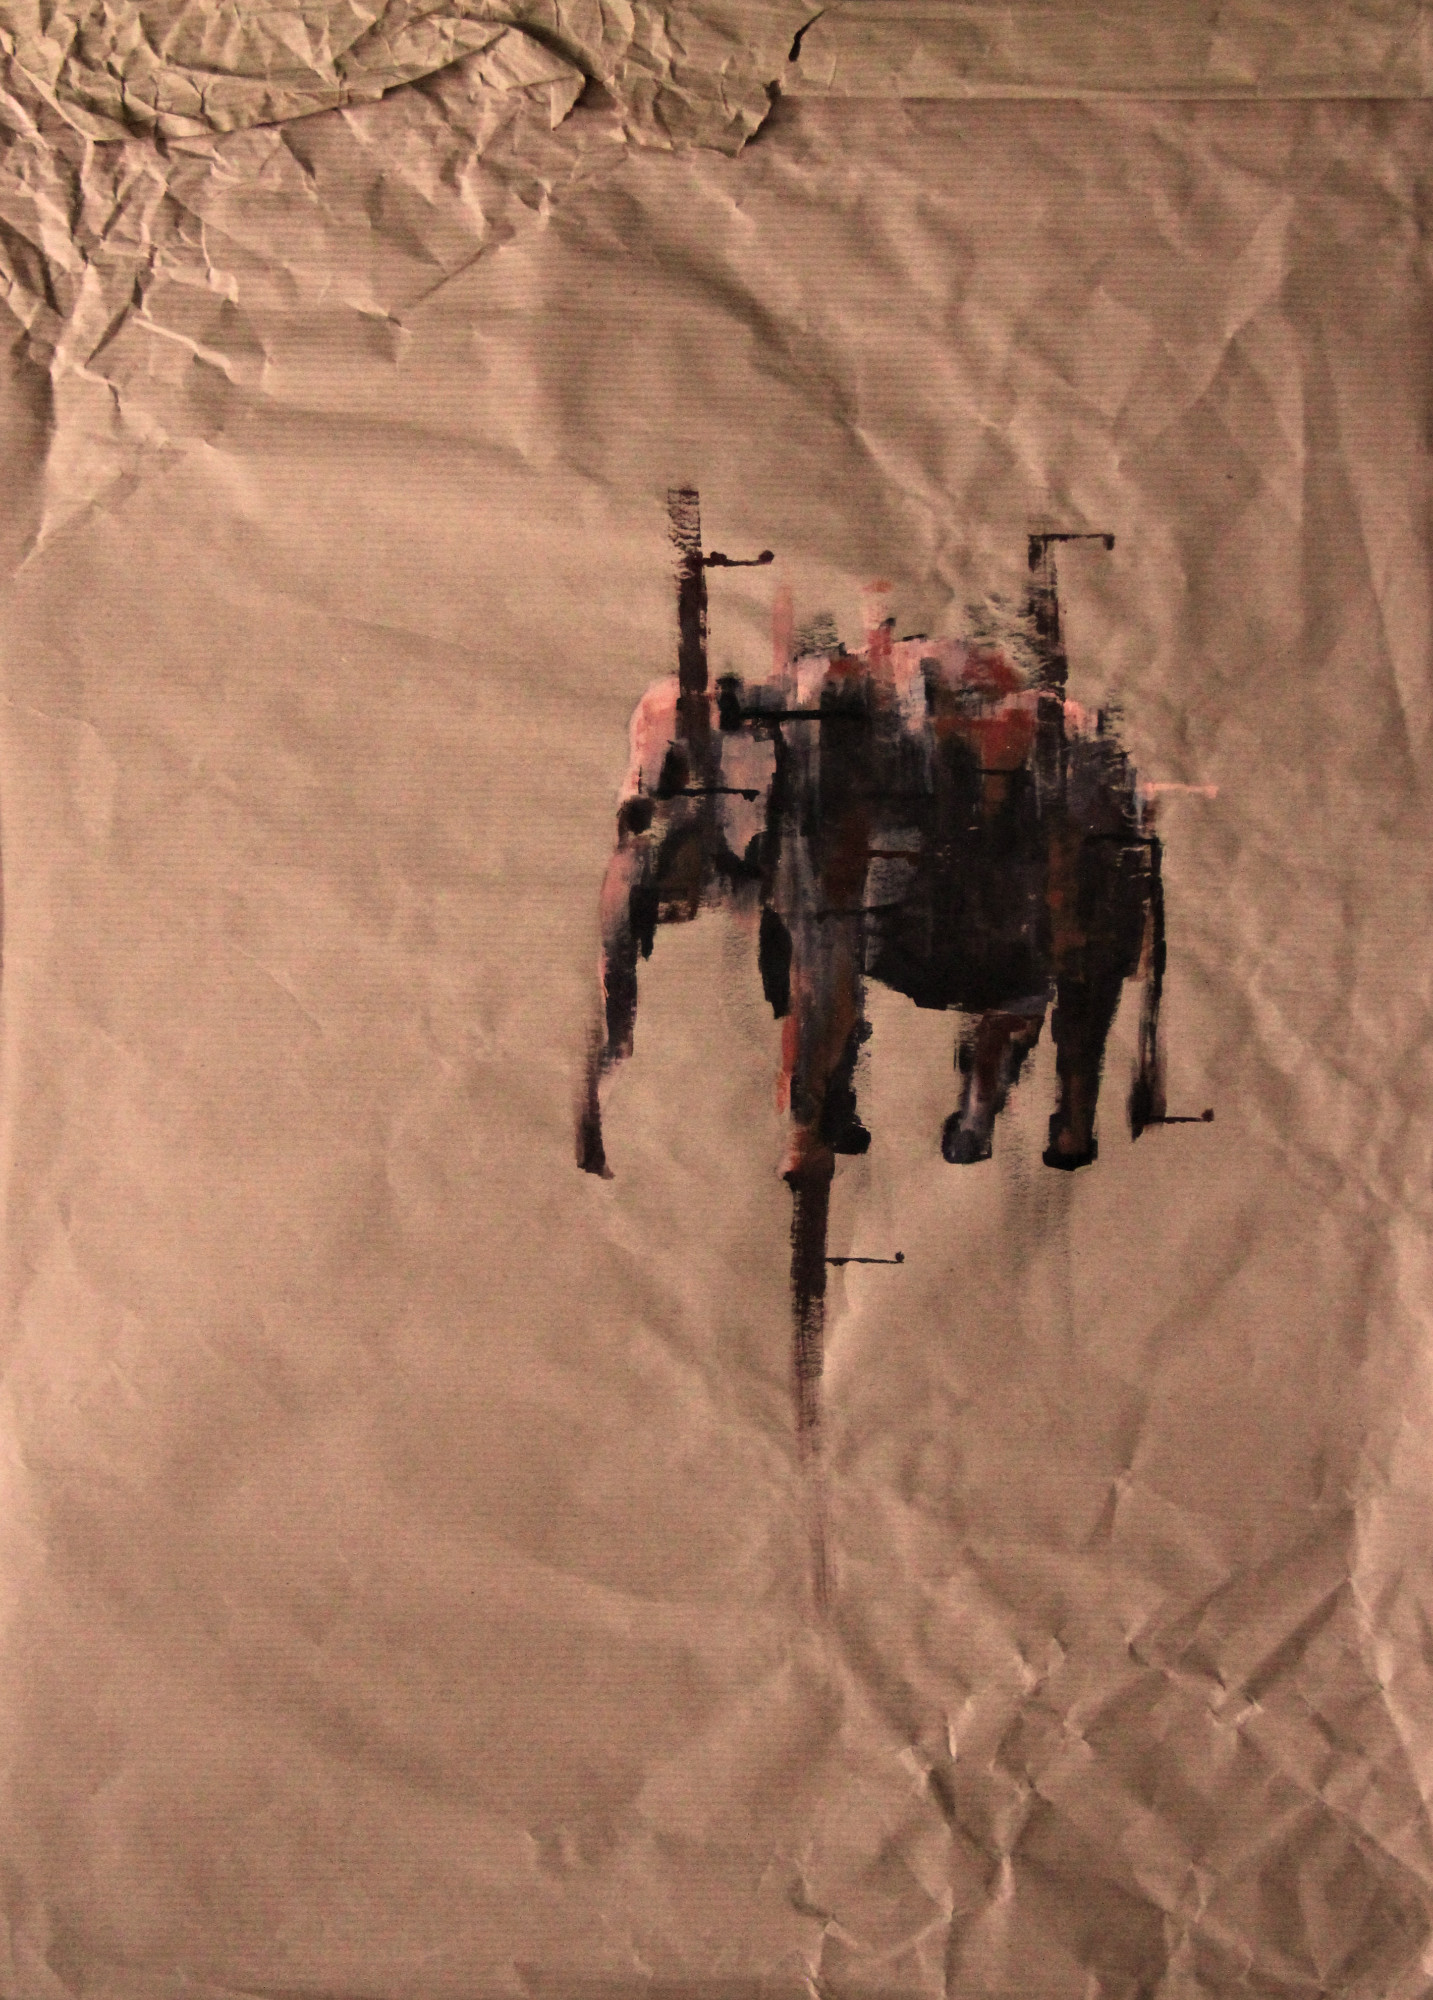 Der Elefant, 50x70cm, Marc Allgaier, 2011